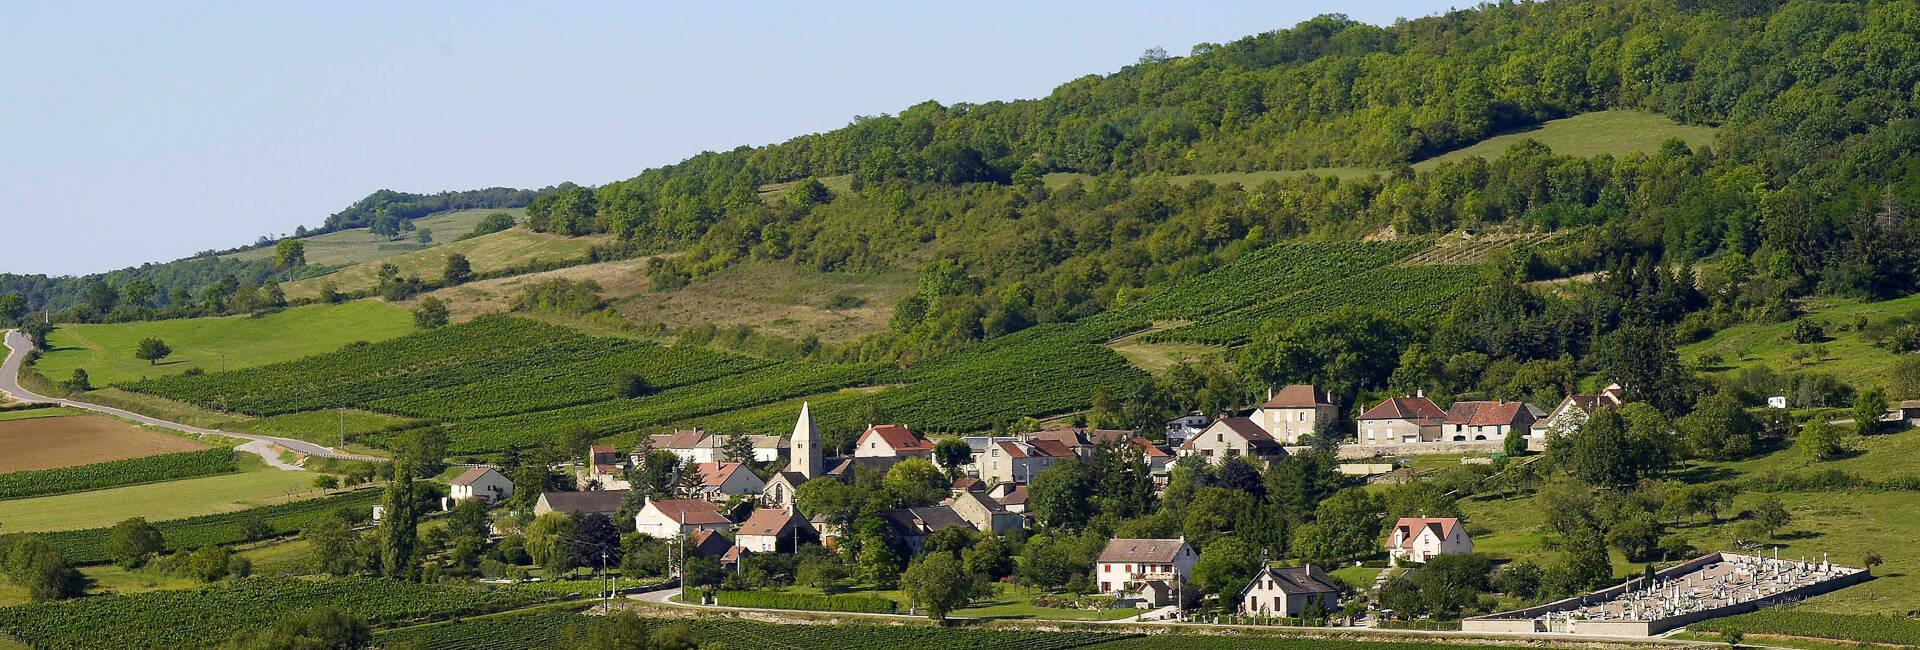 Vineyards around Beaune © Images et associés